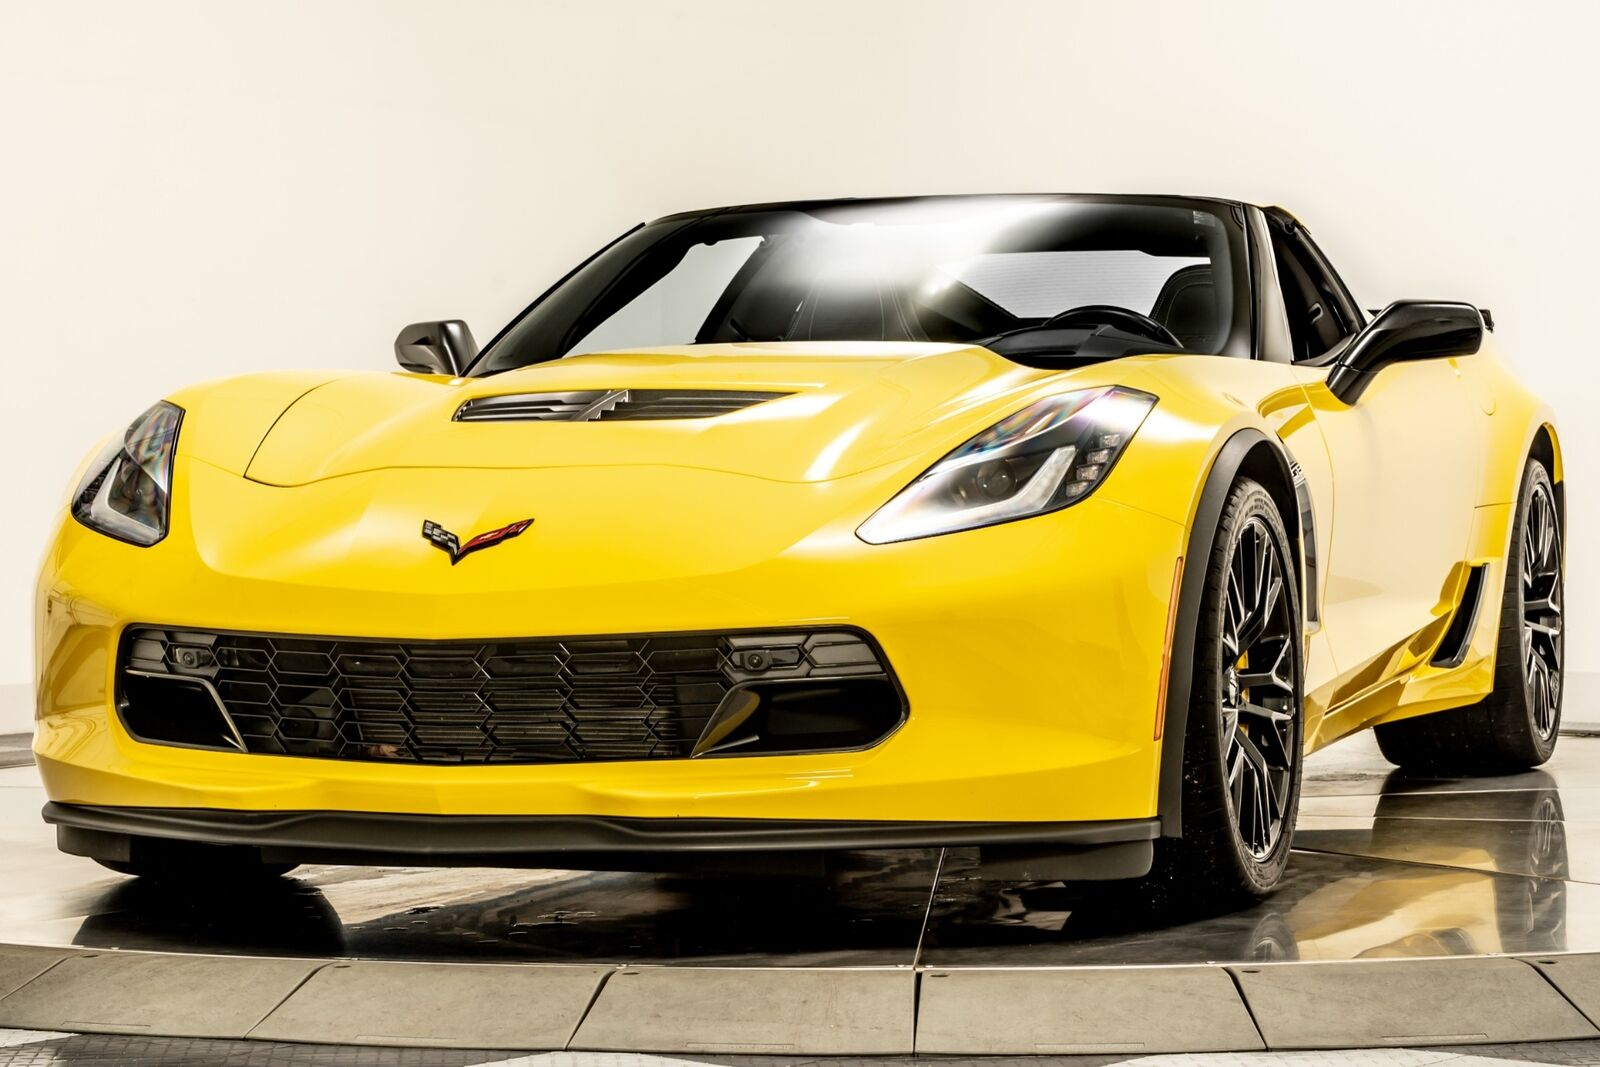 2016 Yellow Chevrolet Corvette Z06  | C7 Corvette Photo 4